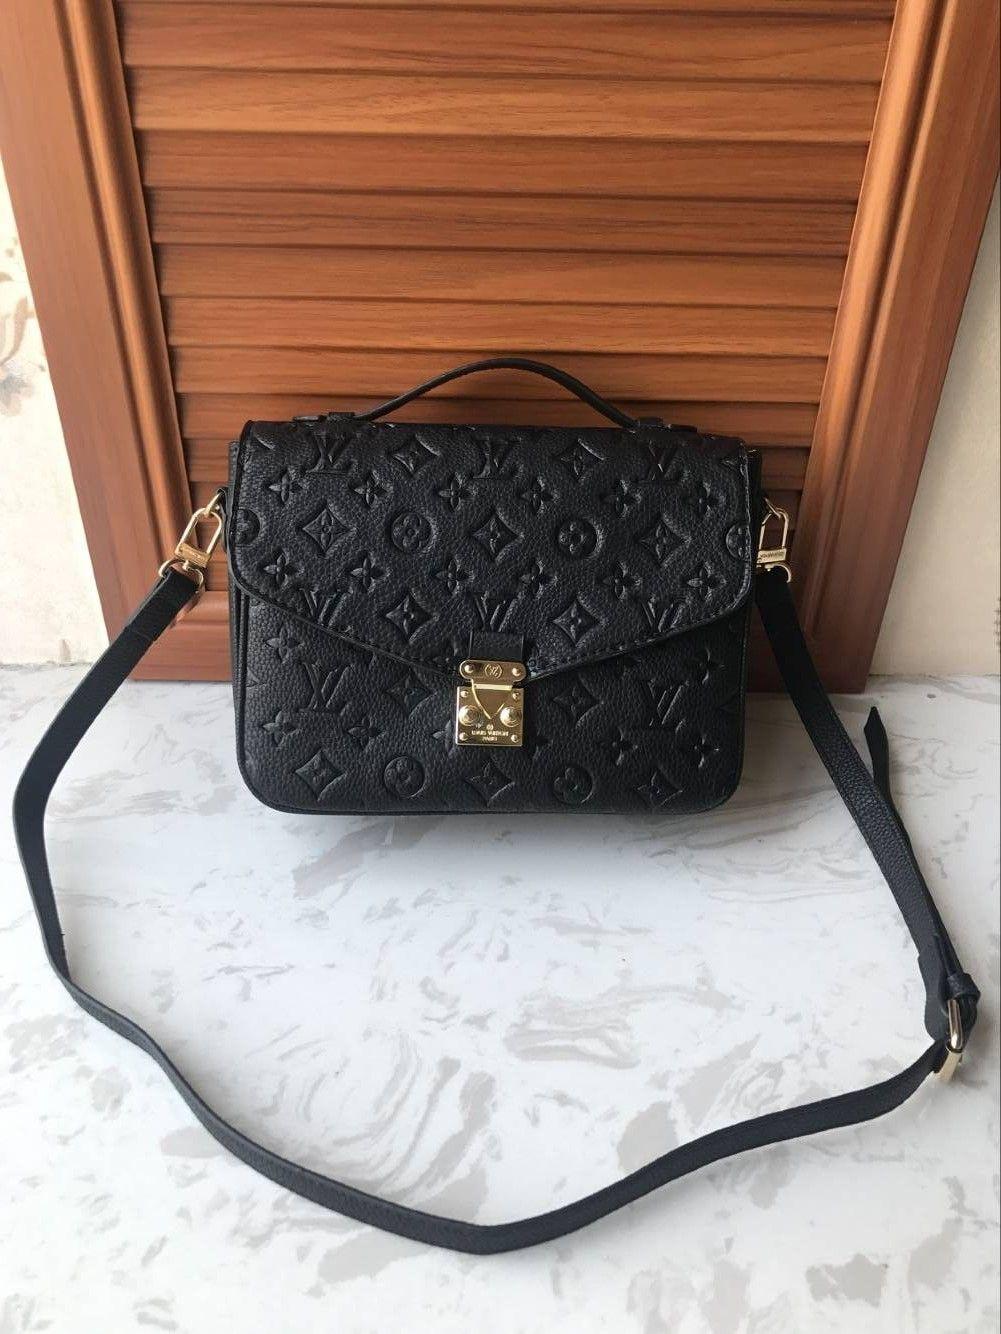 ff5b85366a07 2019 LOUIS VUITTON SUPREME POCHETTE METIS Messenger Bags Women Leather  Handbags Black MICHAEL 0 KOR Shoulder Bags Tote Clutch Satchel M41497 LV  From Cheived ...